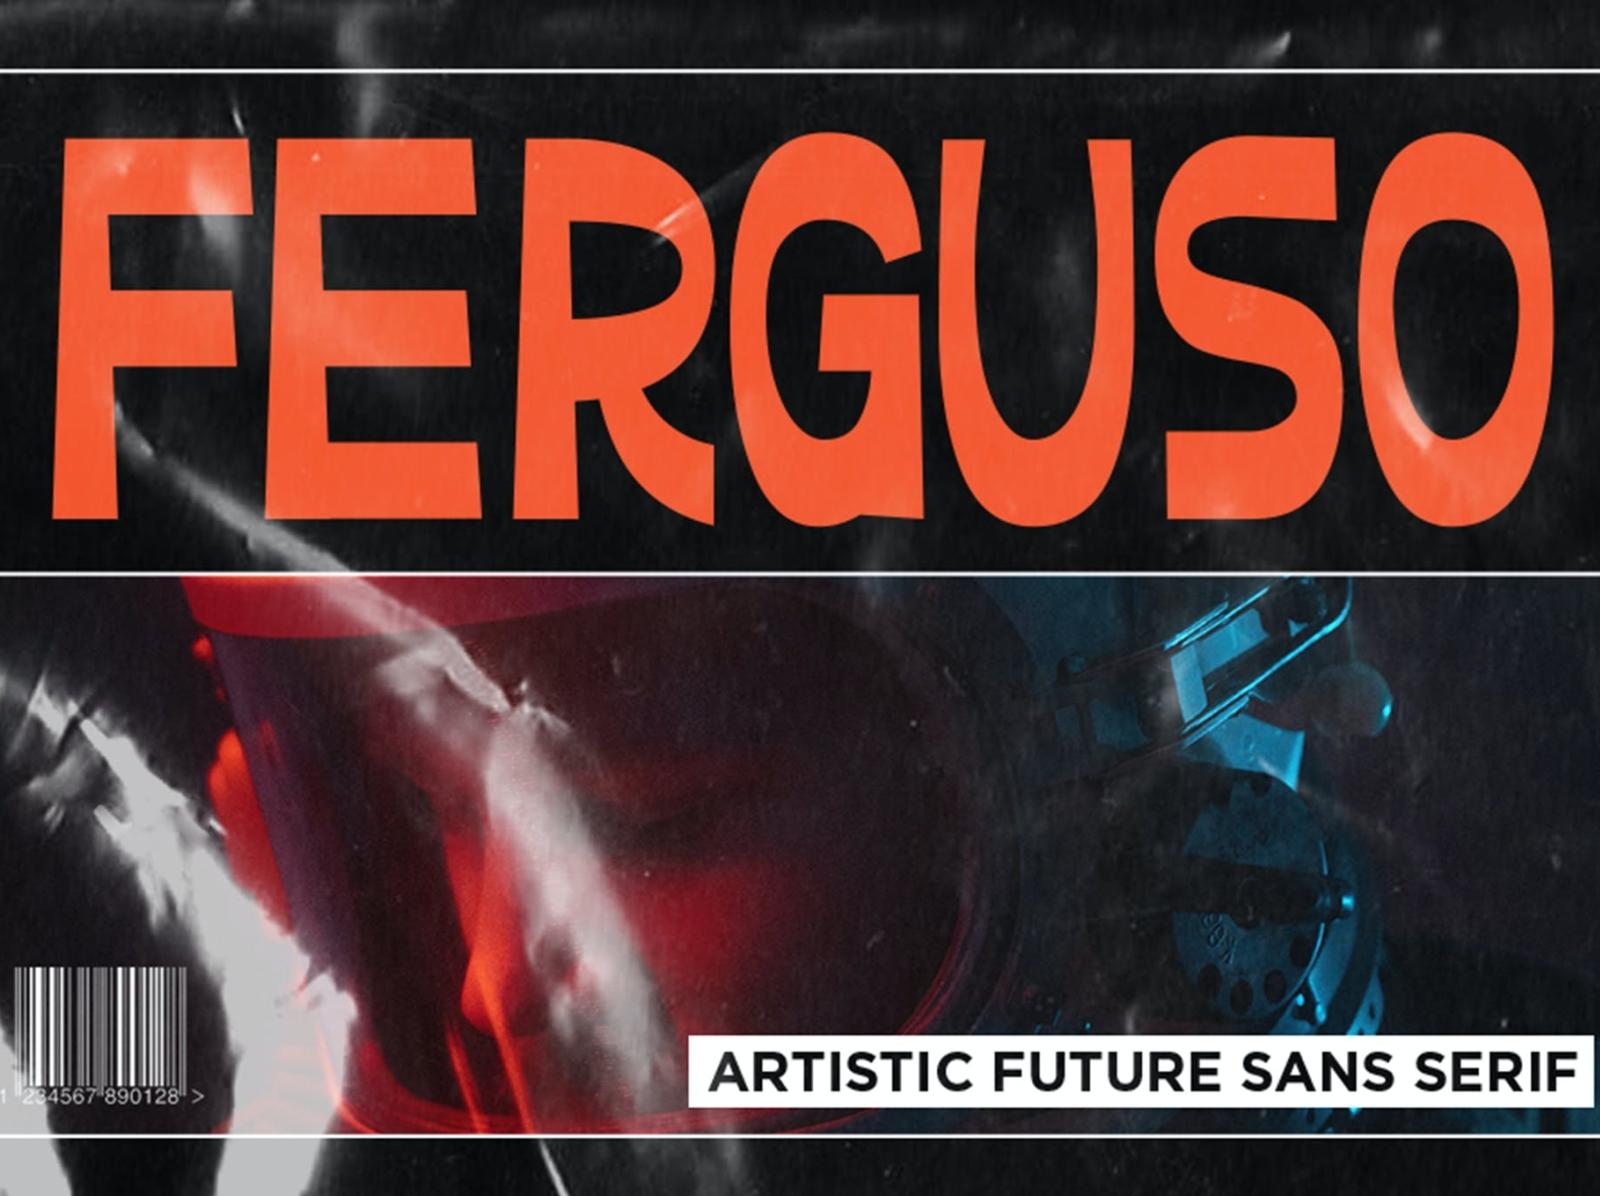 Ferguso - Aesthetic Sans Serif Font display font sans serif aesthetic font display ux vector ui logo app typography illustration graphic design design branding